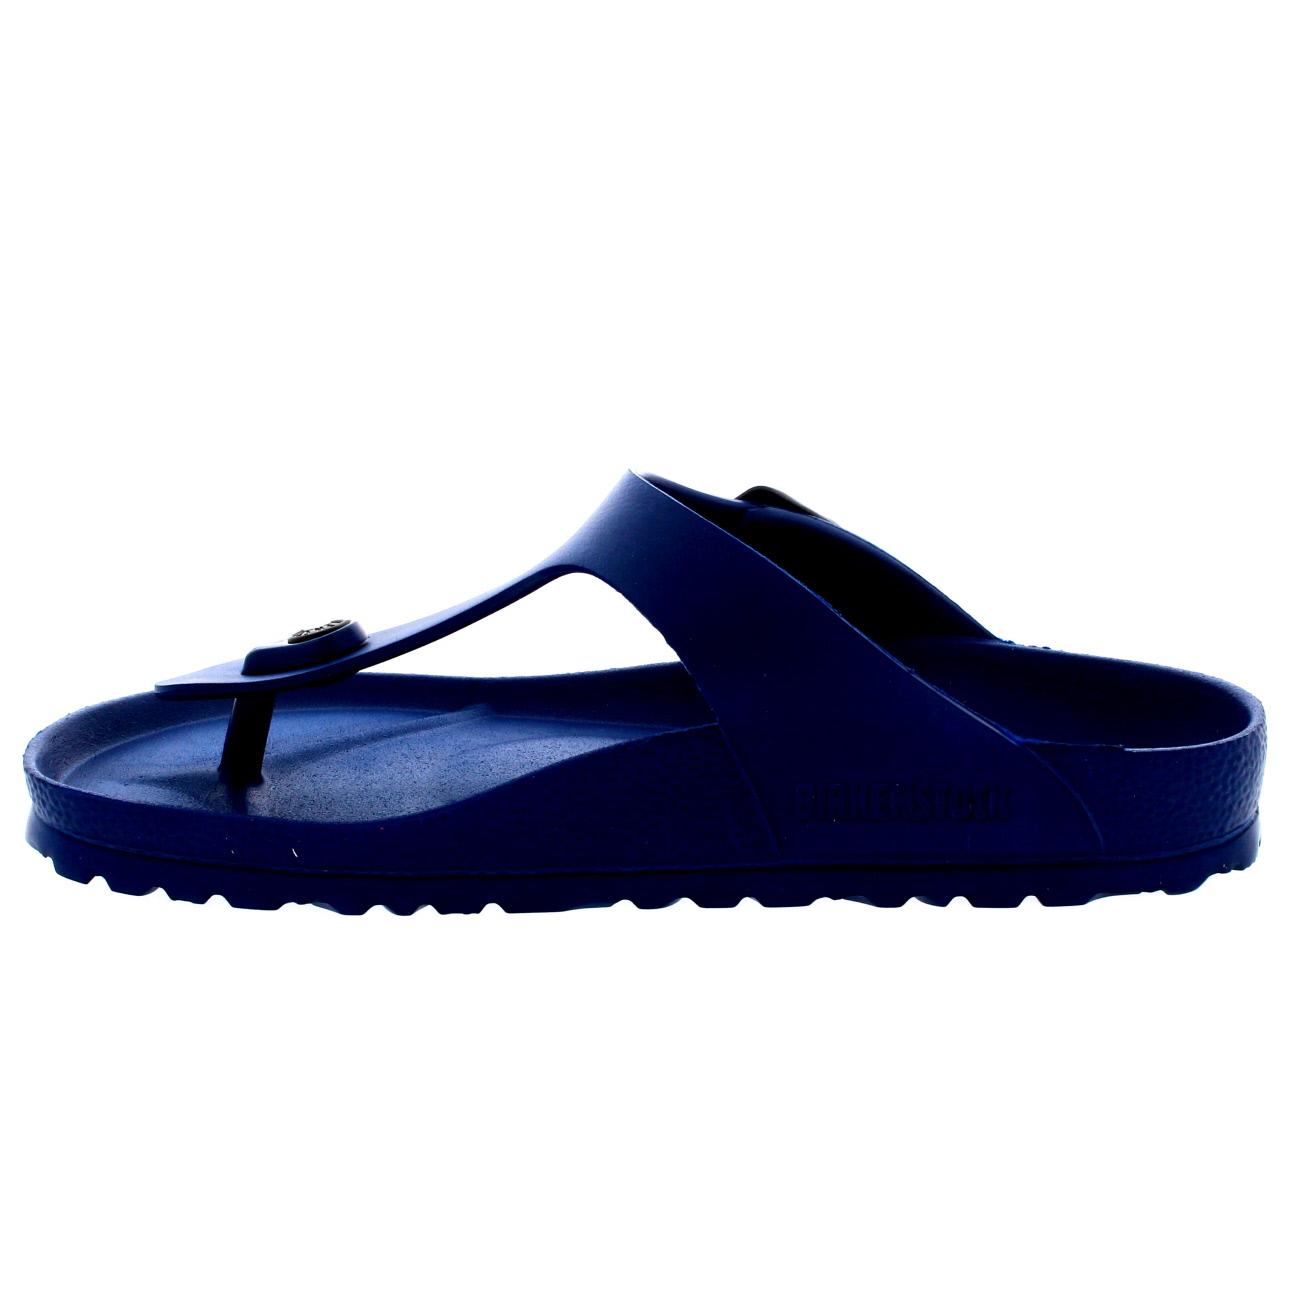 Unisex-Adults-Birkenstock-Gizeh-Summer-EVA-Toe-Post-Beach-Flat-Sandals-All-Sizes thumbnail 21